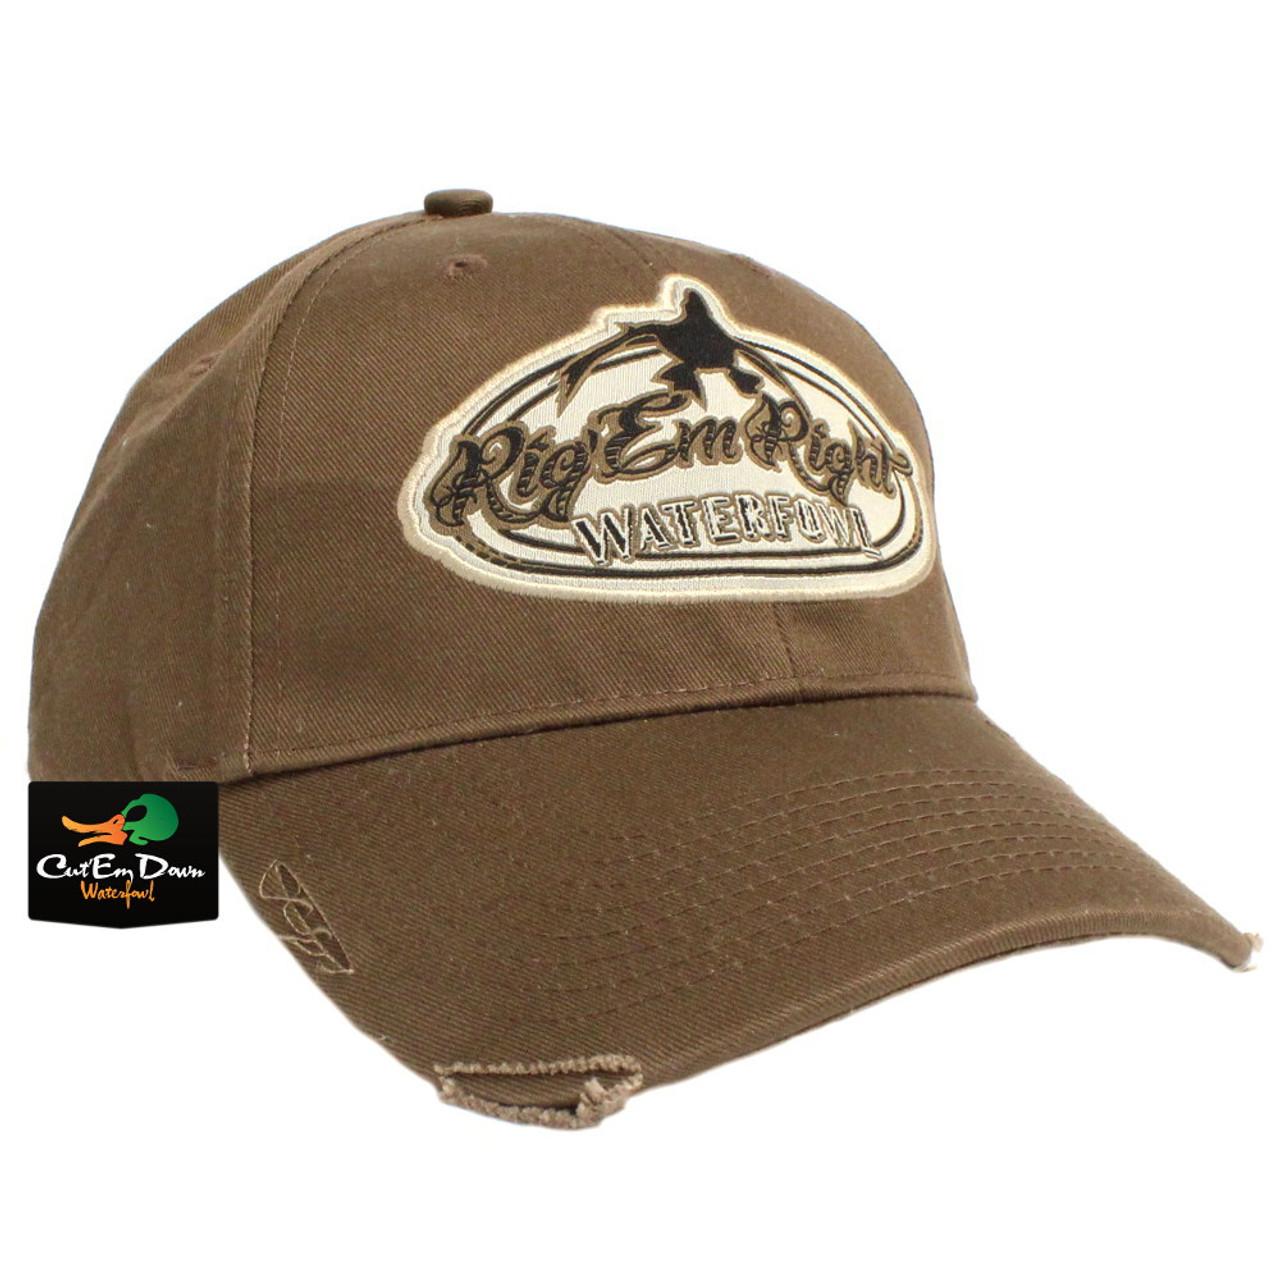 3b9cb5c2657 Rig Em Right Waterfowl Brown Distressed Hat